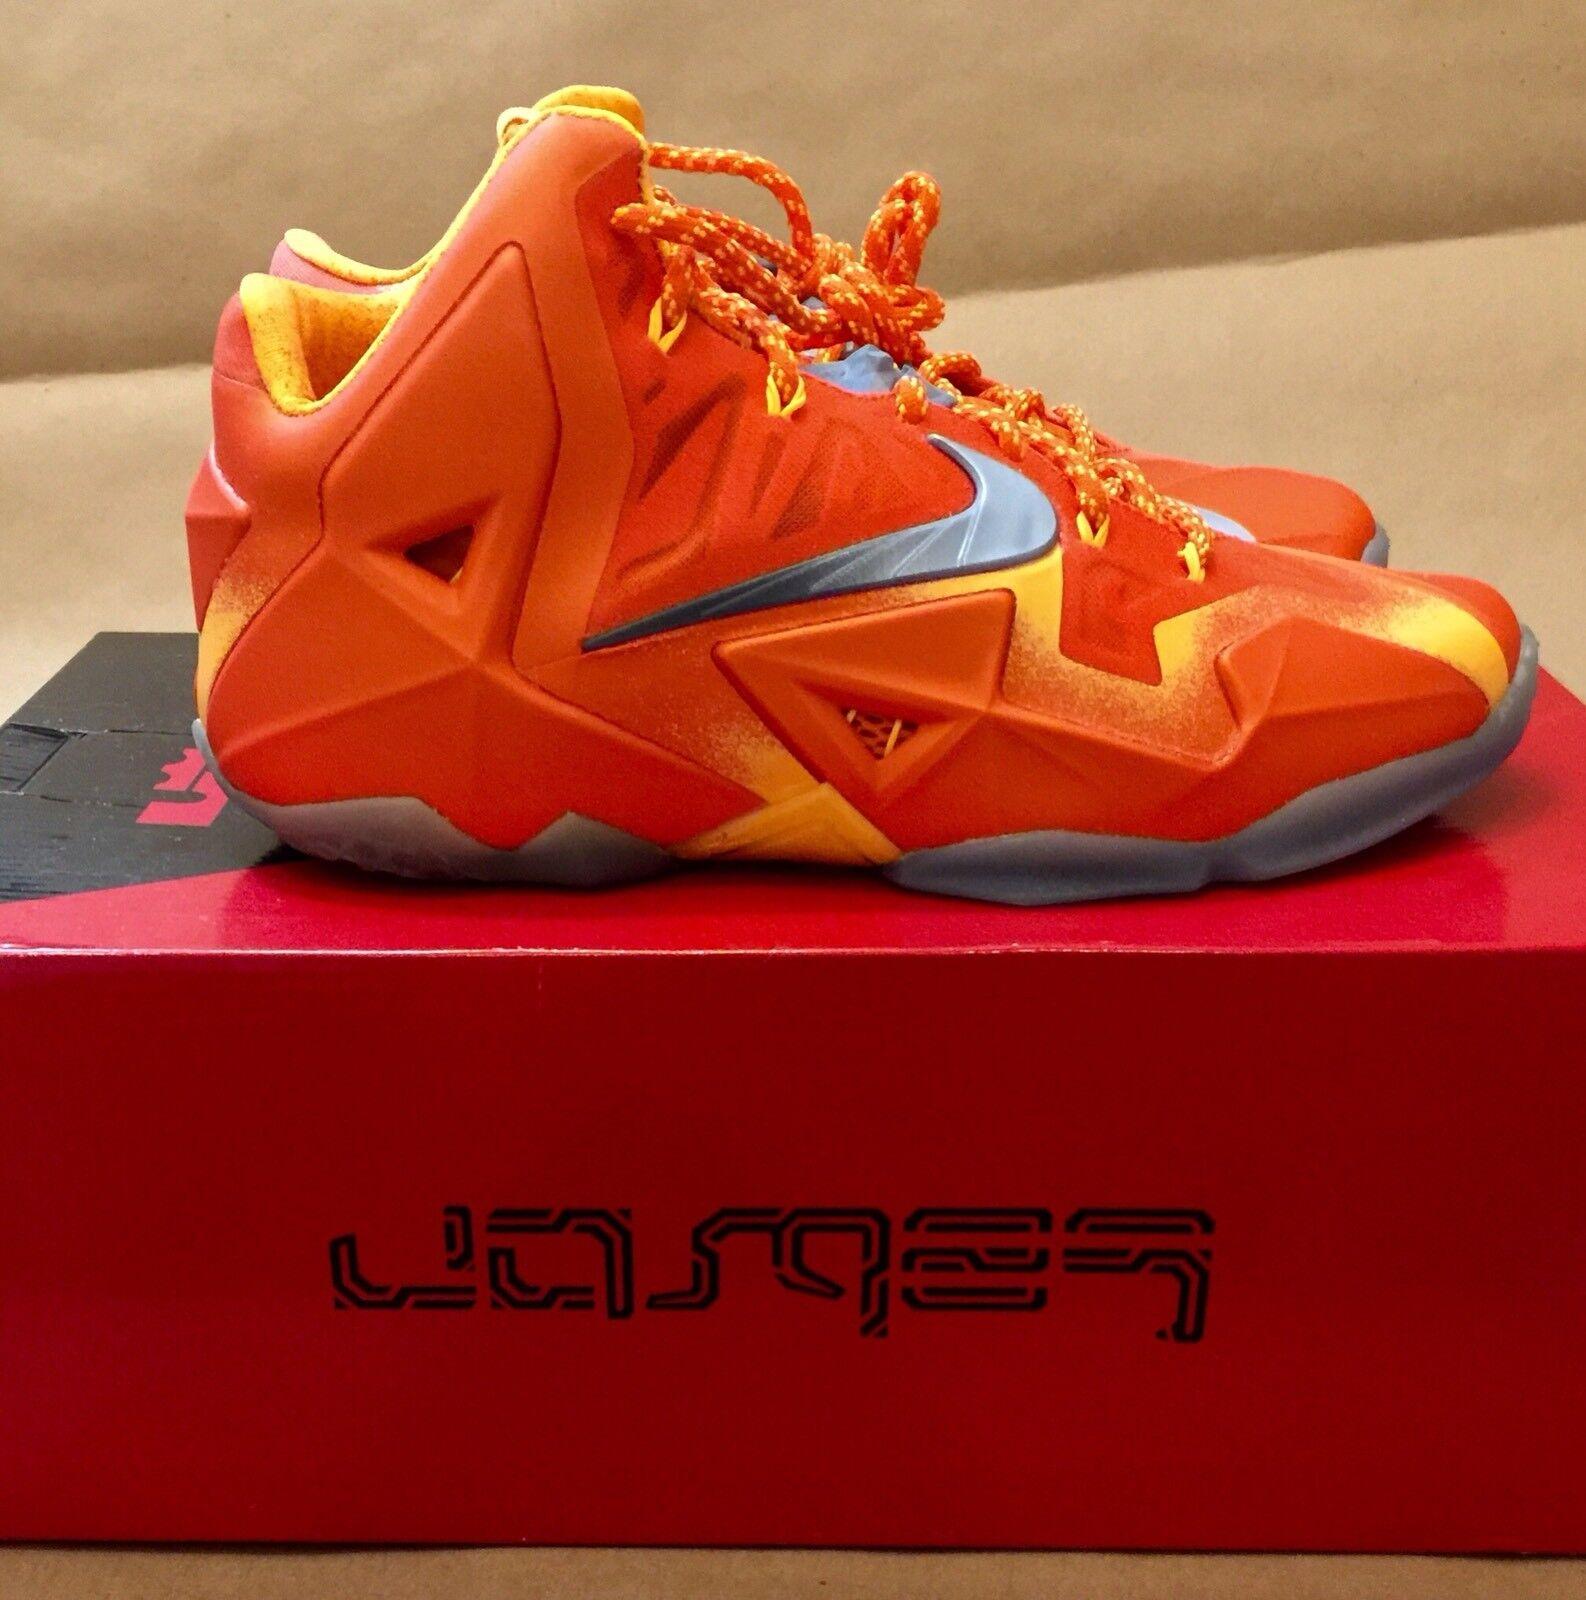 Nike LeBron 11 Preheat Forging Iron Urban  626376 800 US 9.5